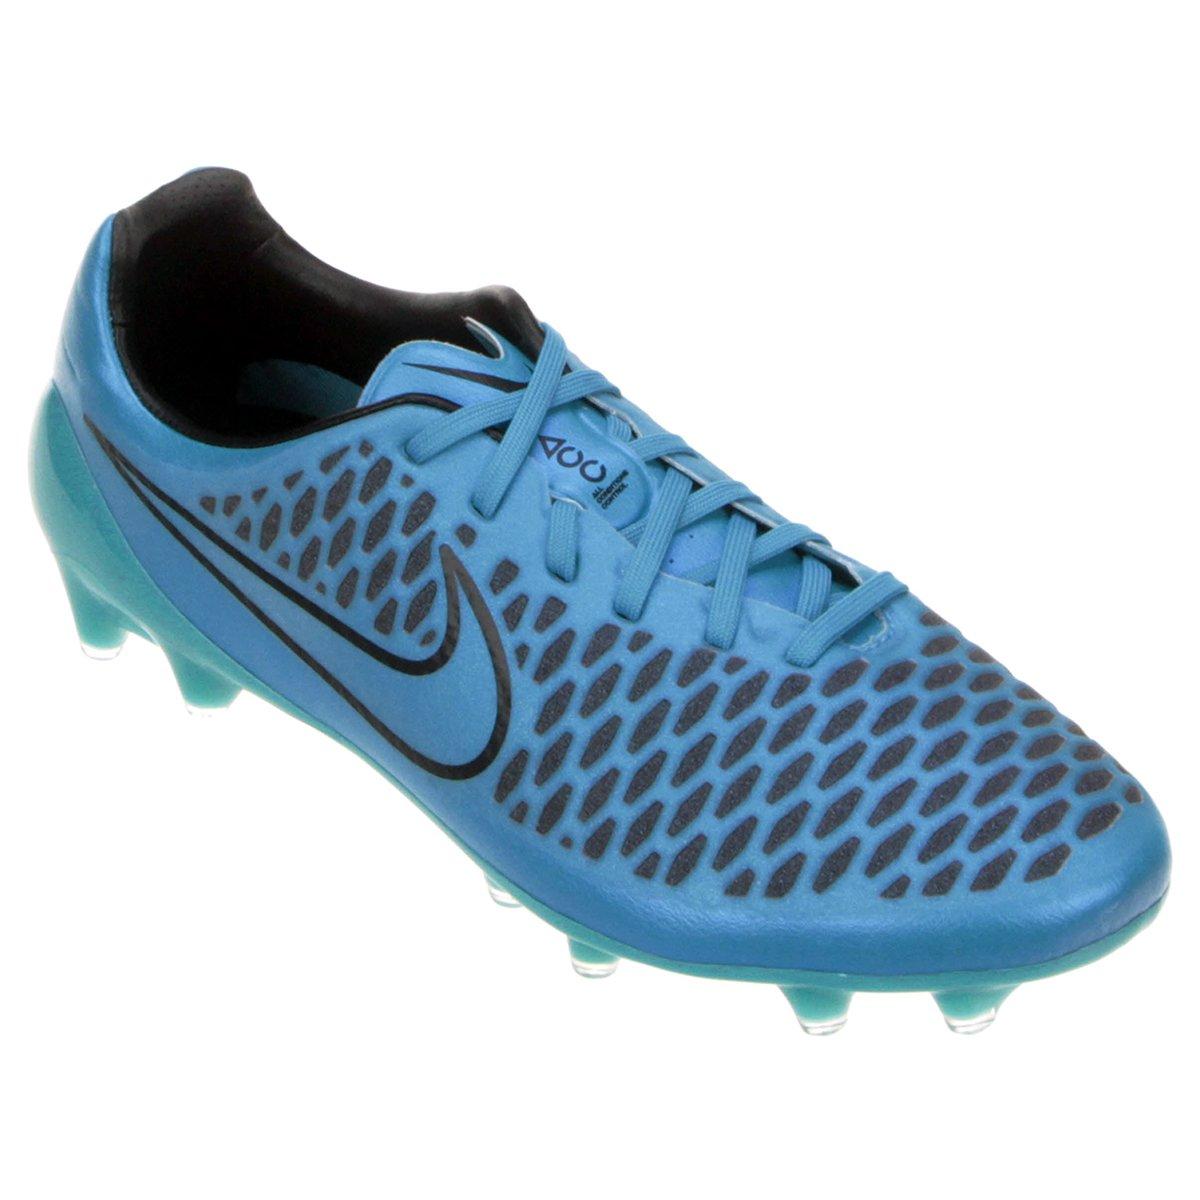 34339f9c94 Chuteira Nike Magista Opus FG Campo - Compre Agora